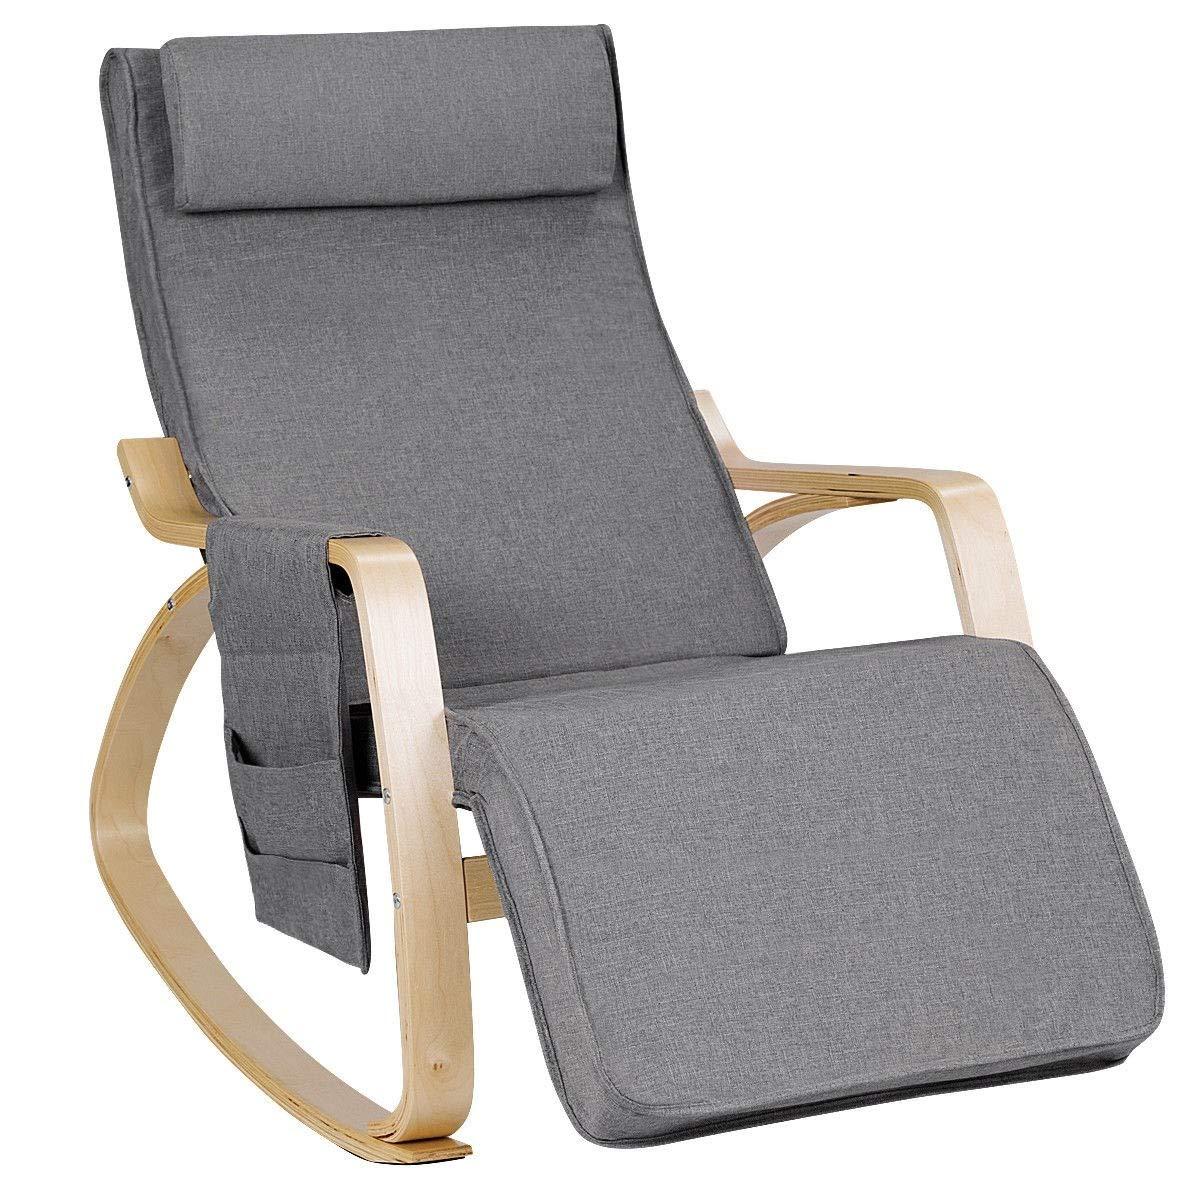 Relax Adjustable Lounge Rocking Chair with Pillow & Pocket Comfortable Armrest Backrest Adjustable Footrest by USA_BEST_SELLER